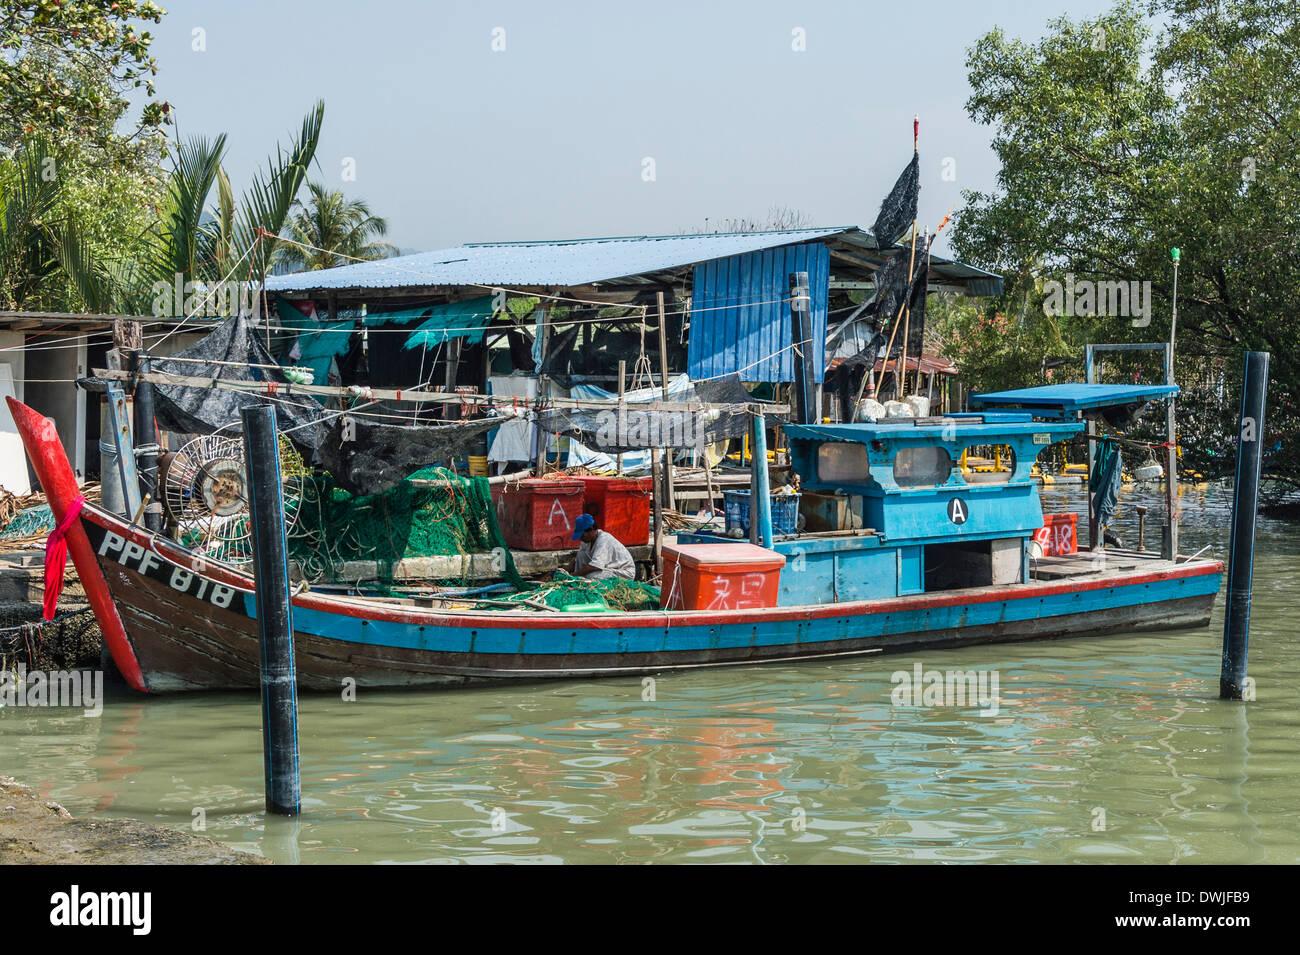 A Chinese fishing fleet in Penang - Stock Image